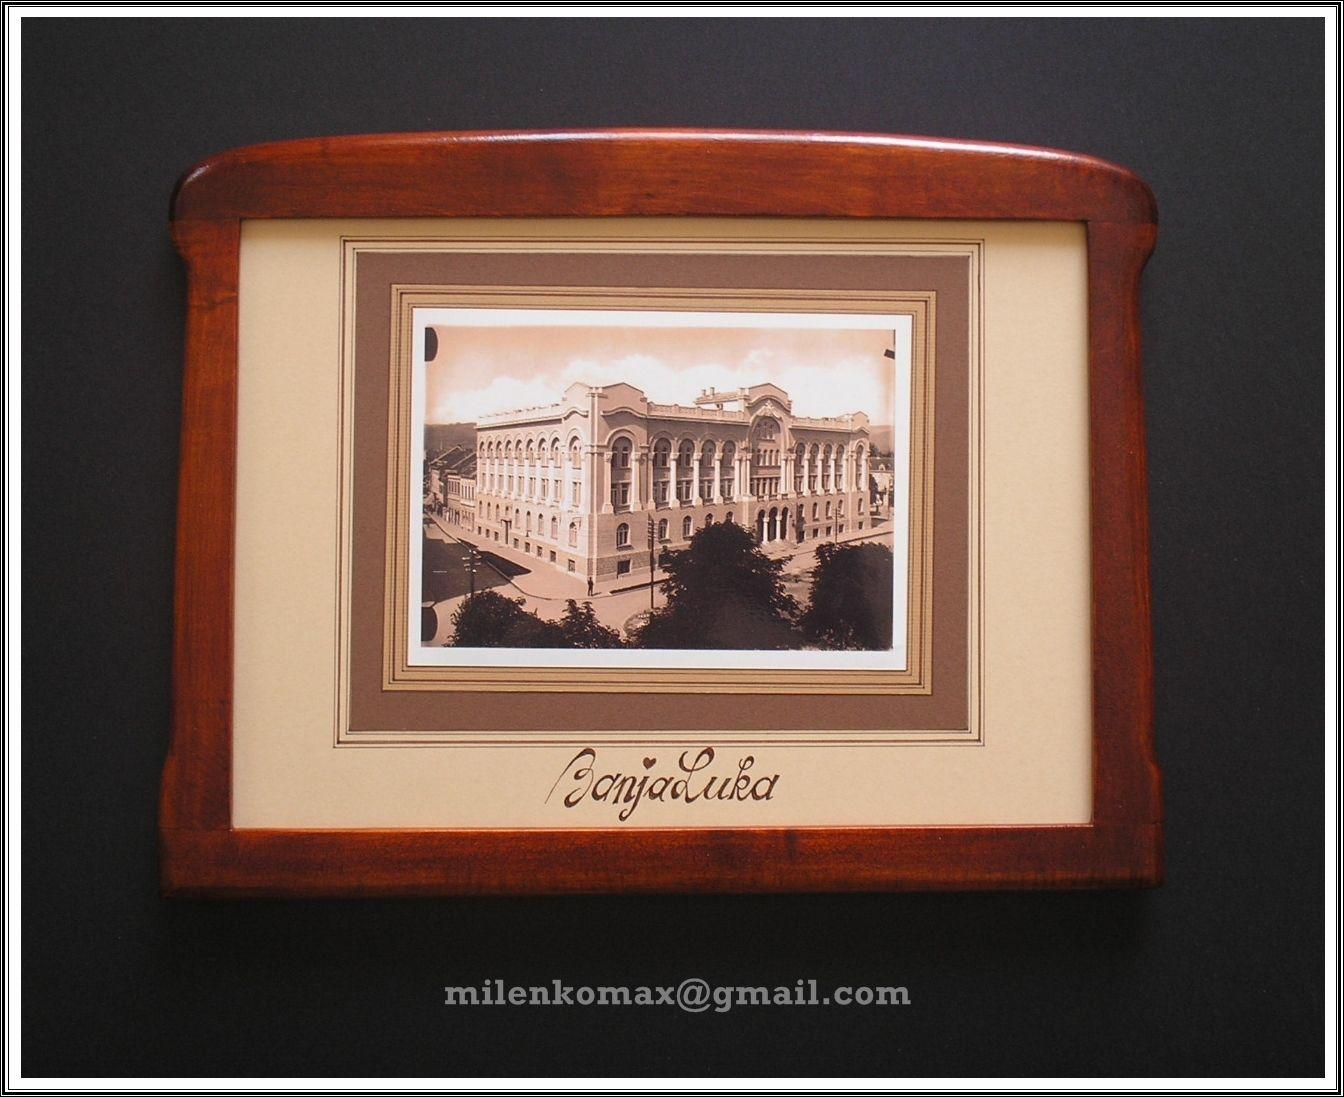 Uramljena stara fotografija-Banja Luka-Suvenir-Old photo frame-old ...